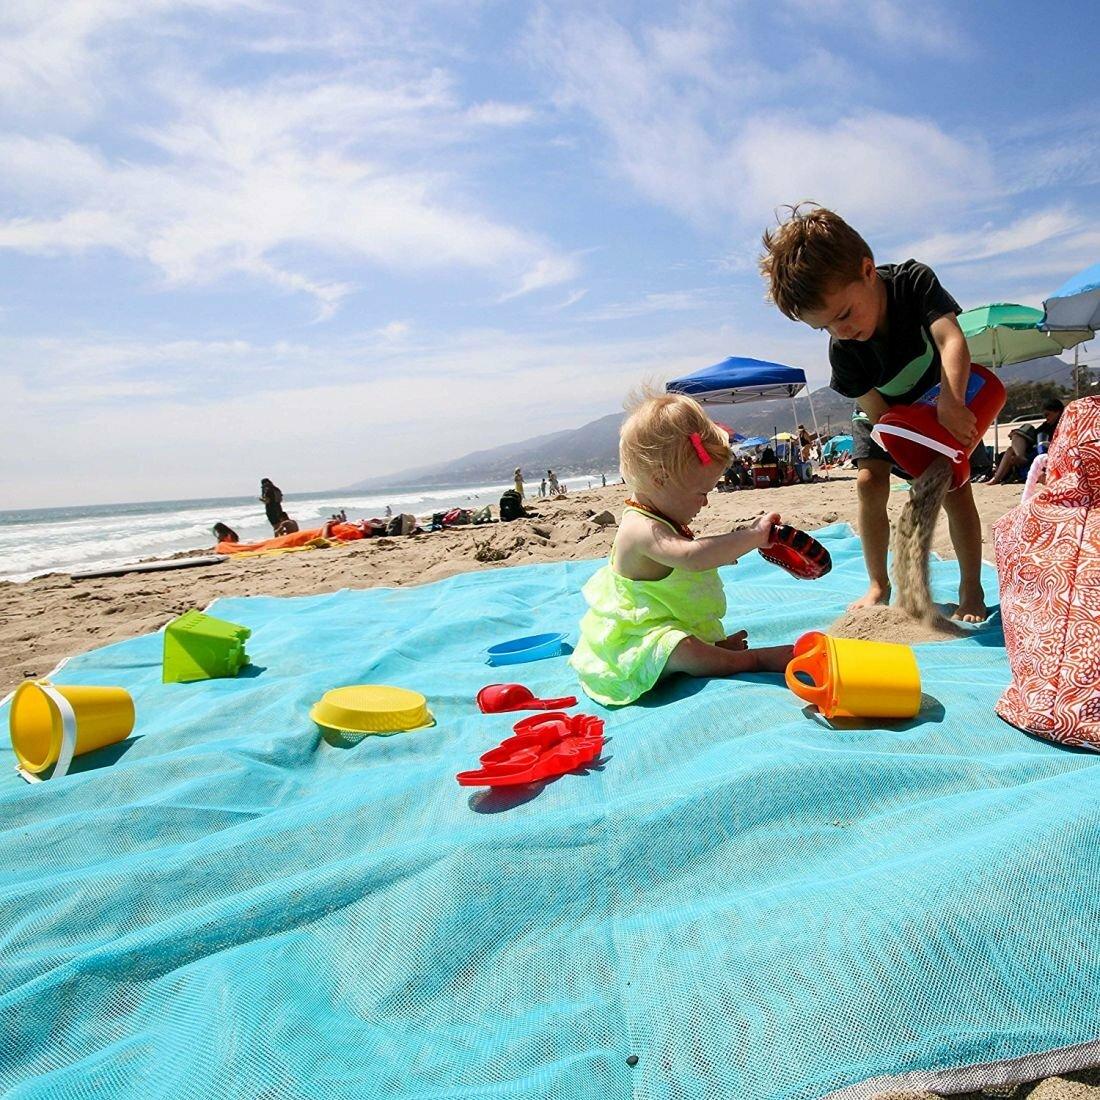 Пляжная подстилка ClapSand анти-песок в Днепропетровске